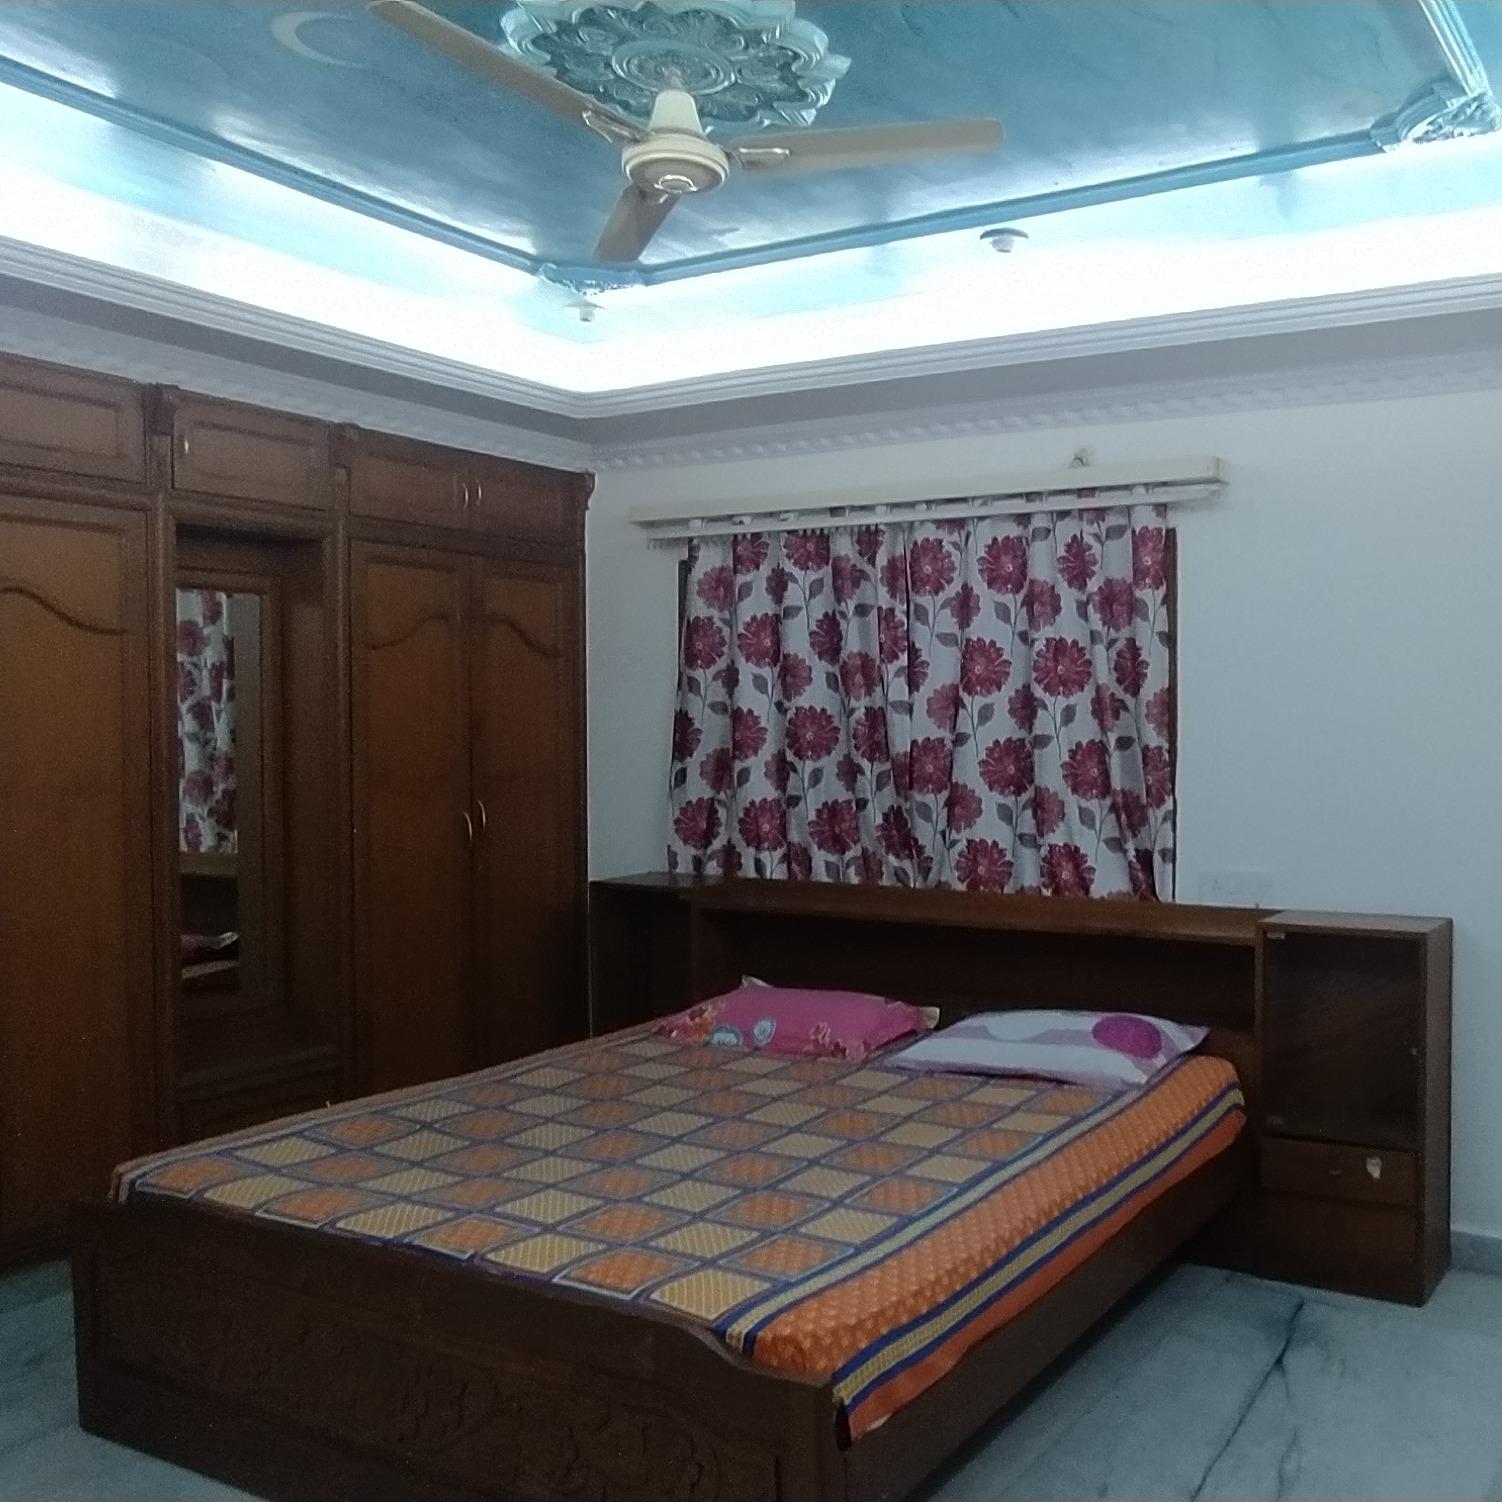 master-bedroom-Picture-sai-madhuri-enclave-ameerpet-2605846